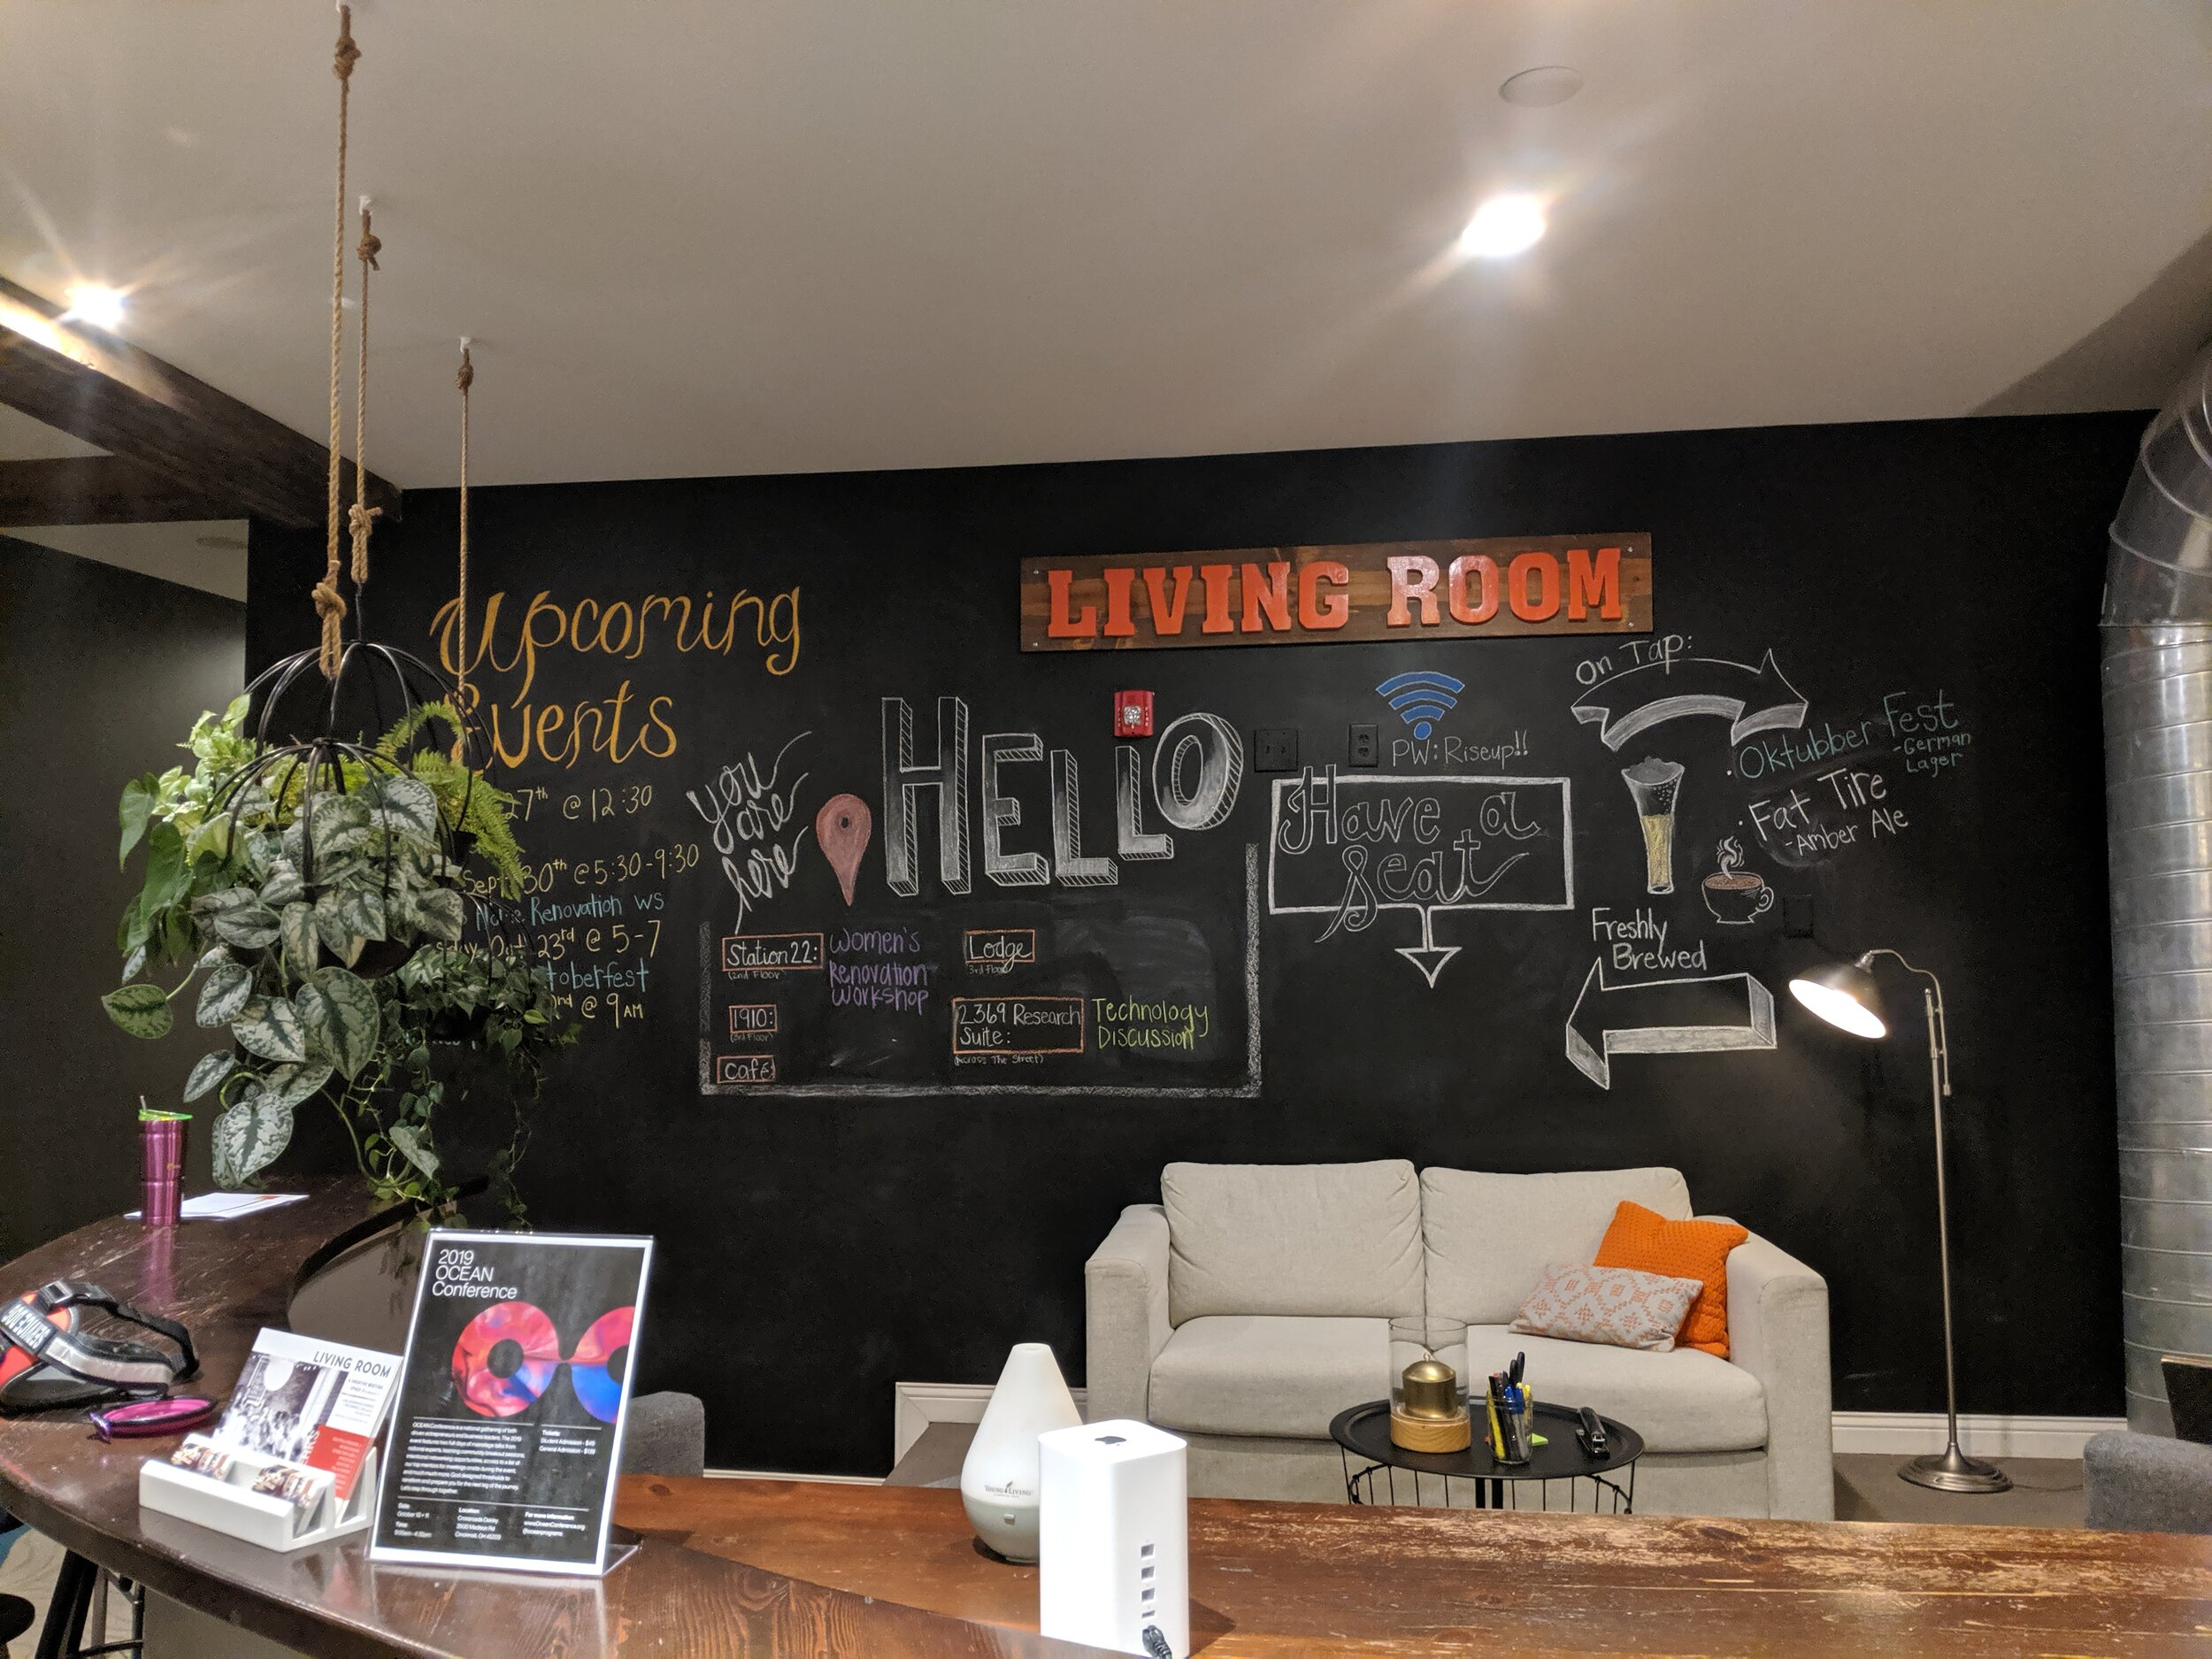 The Living Room in Cincinatti